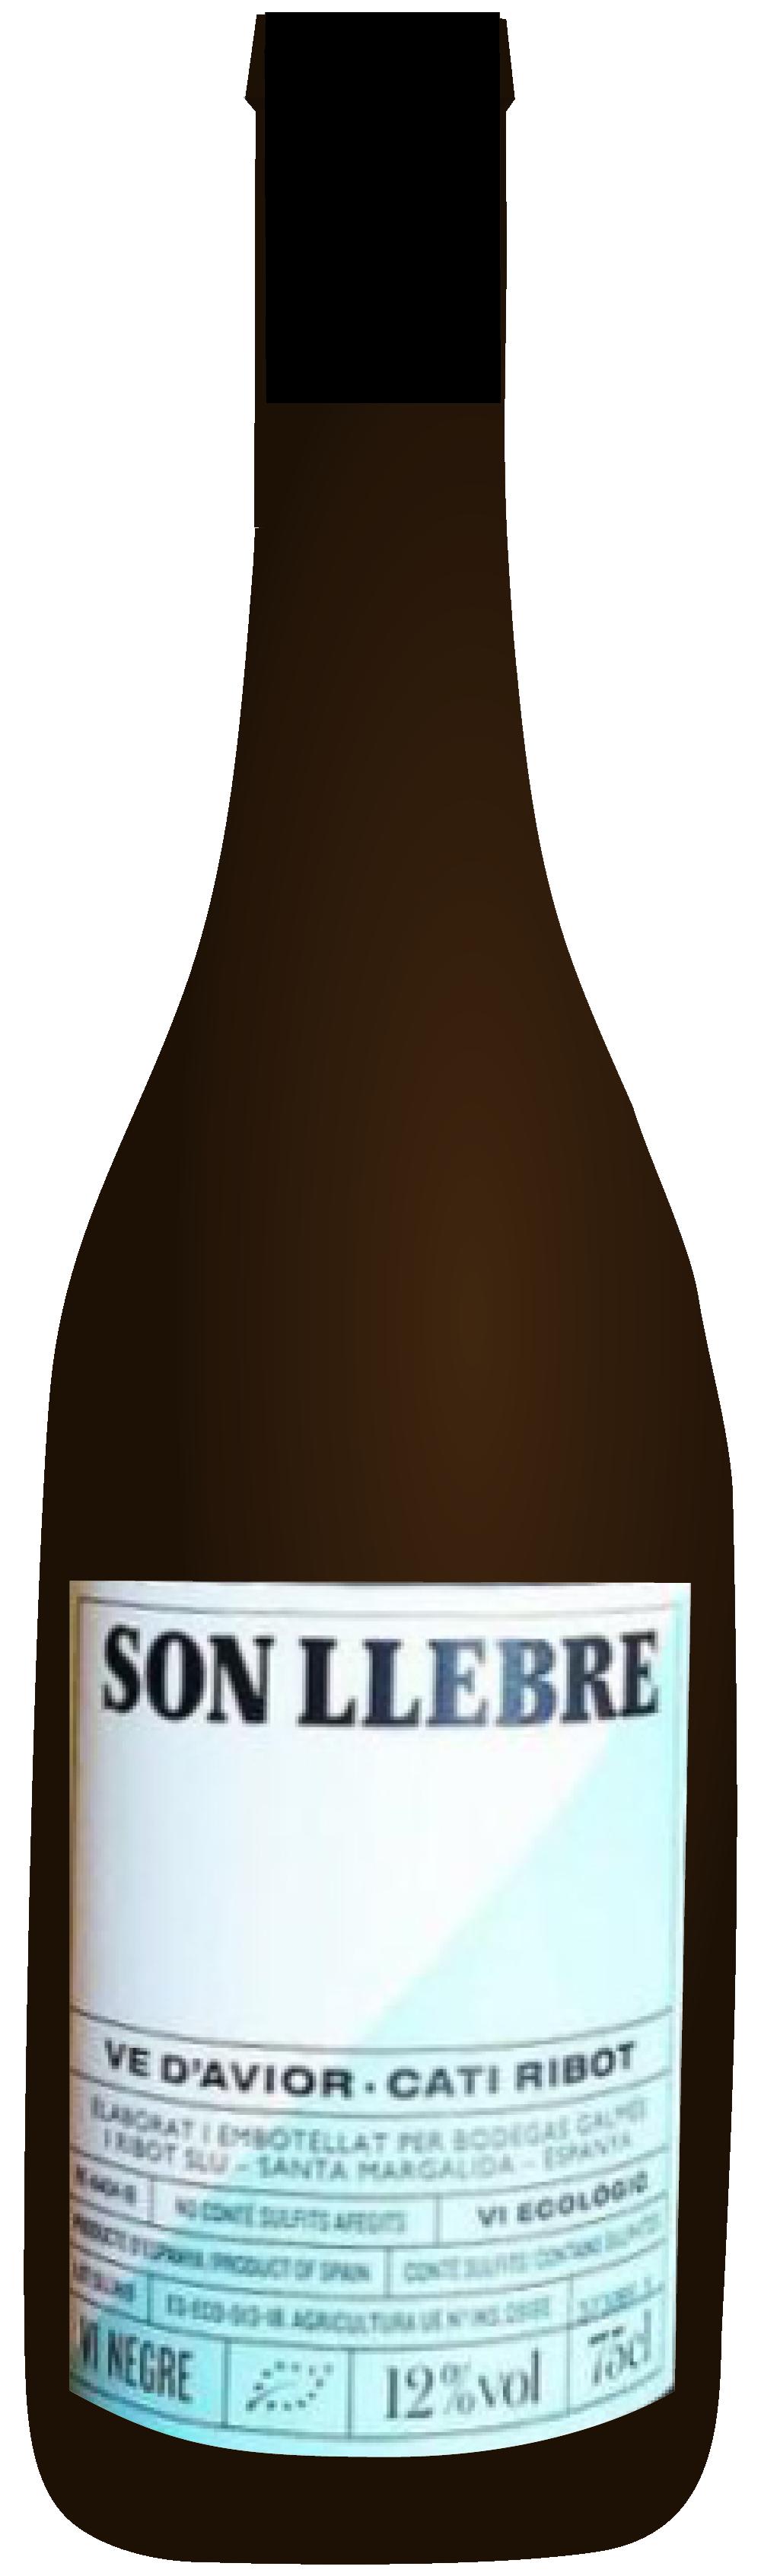 the natural wine company club december 2020 spain avior son llebre 2